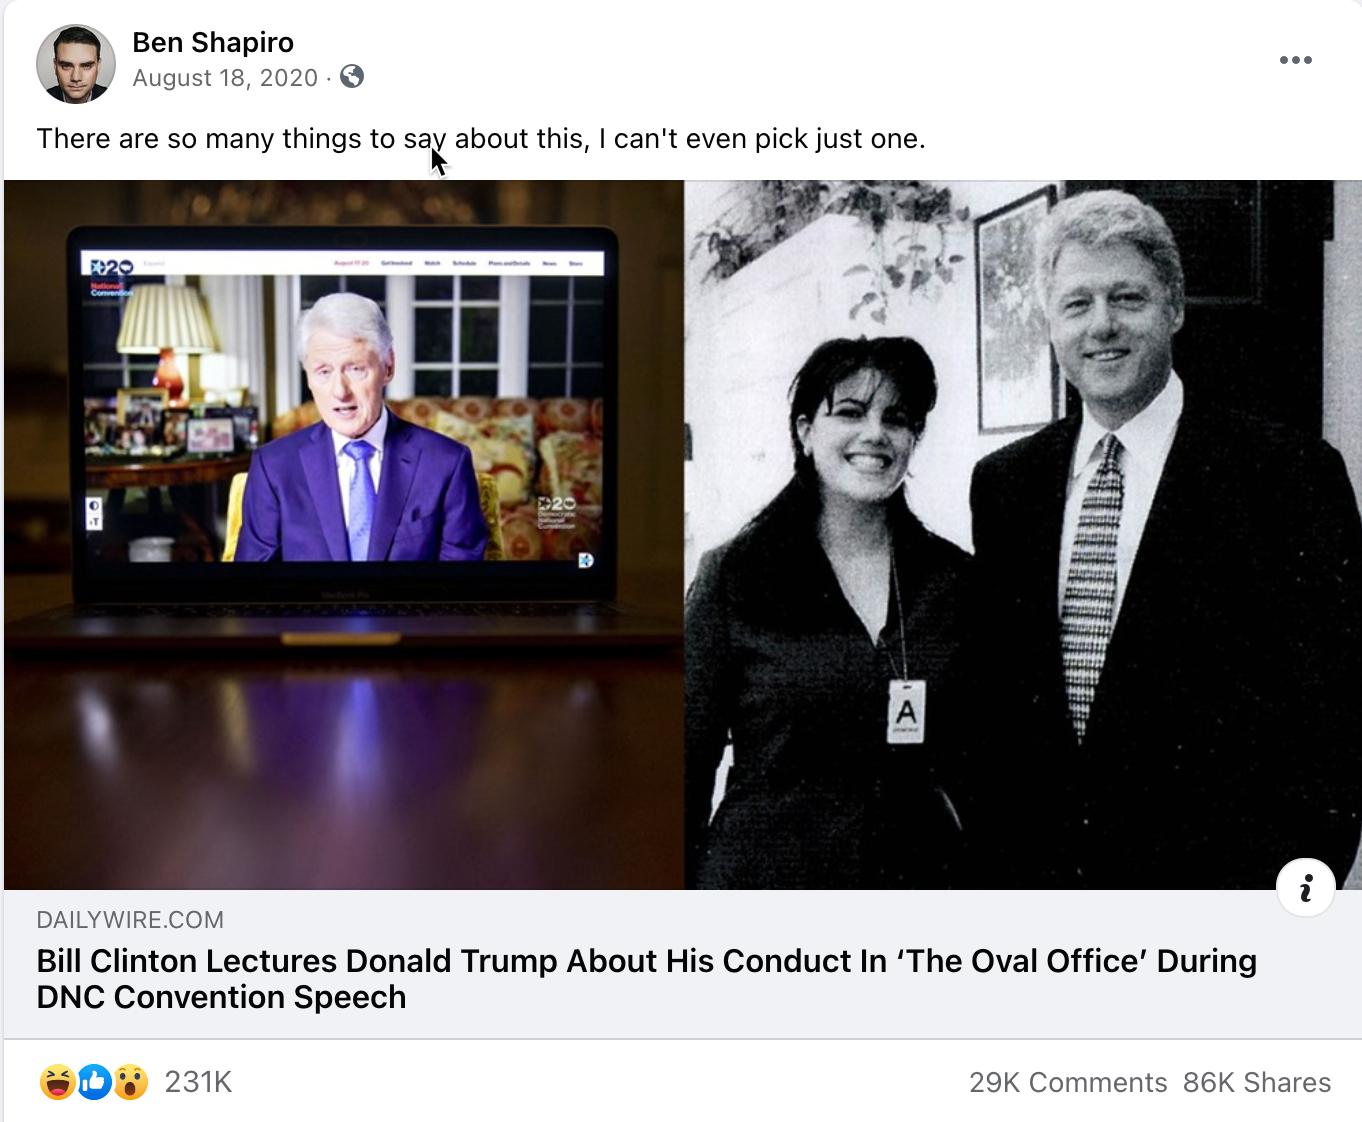 Ben Shapiro_facebook post_20200818